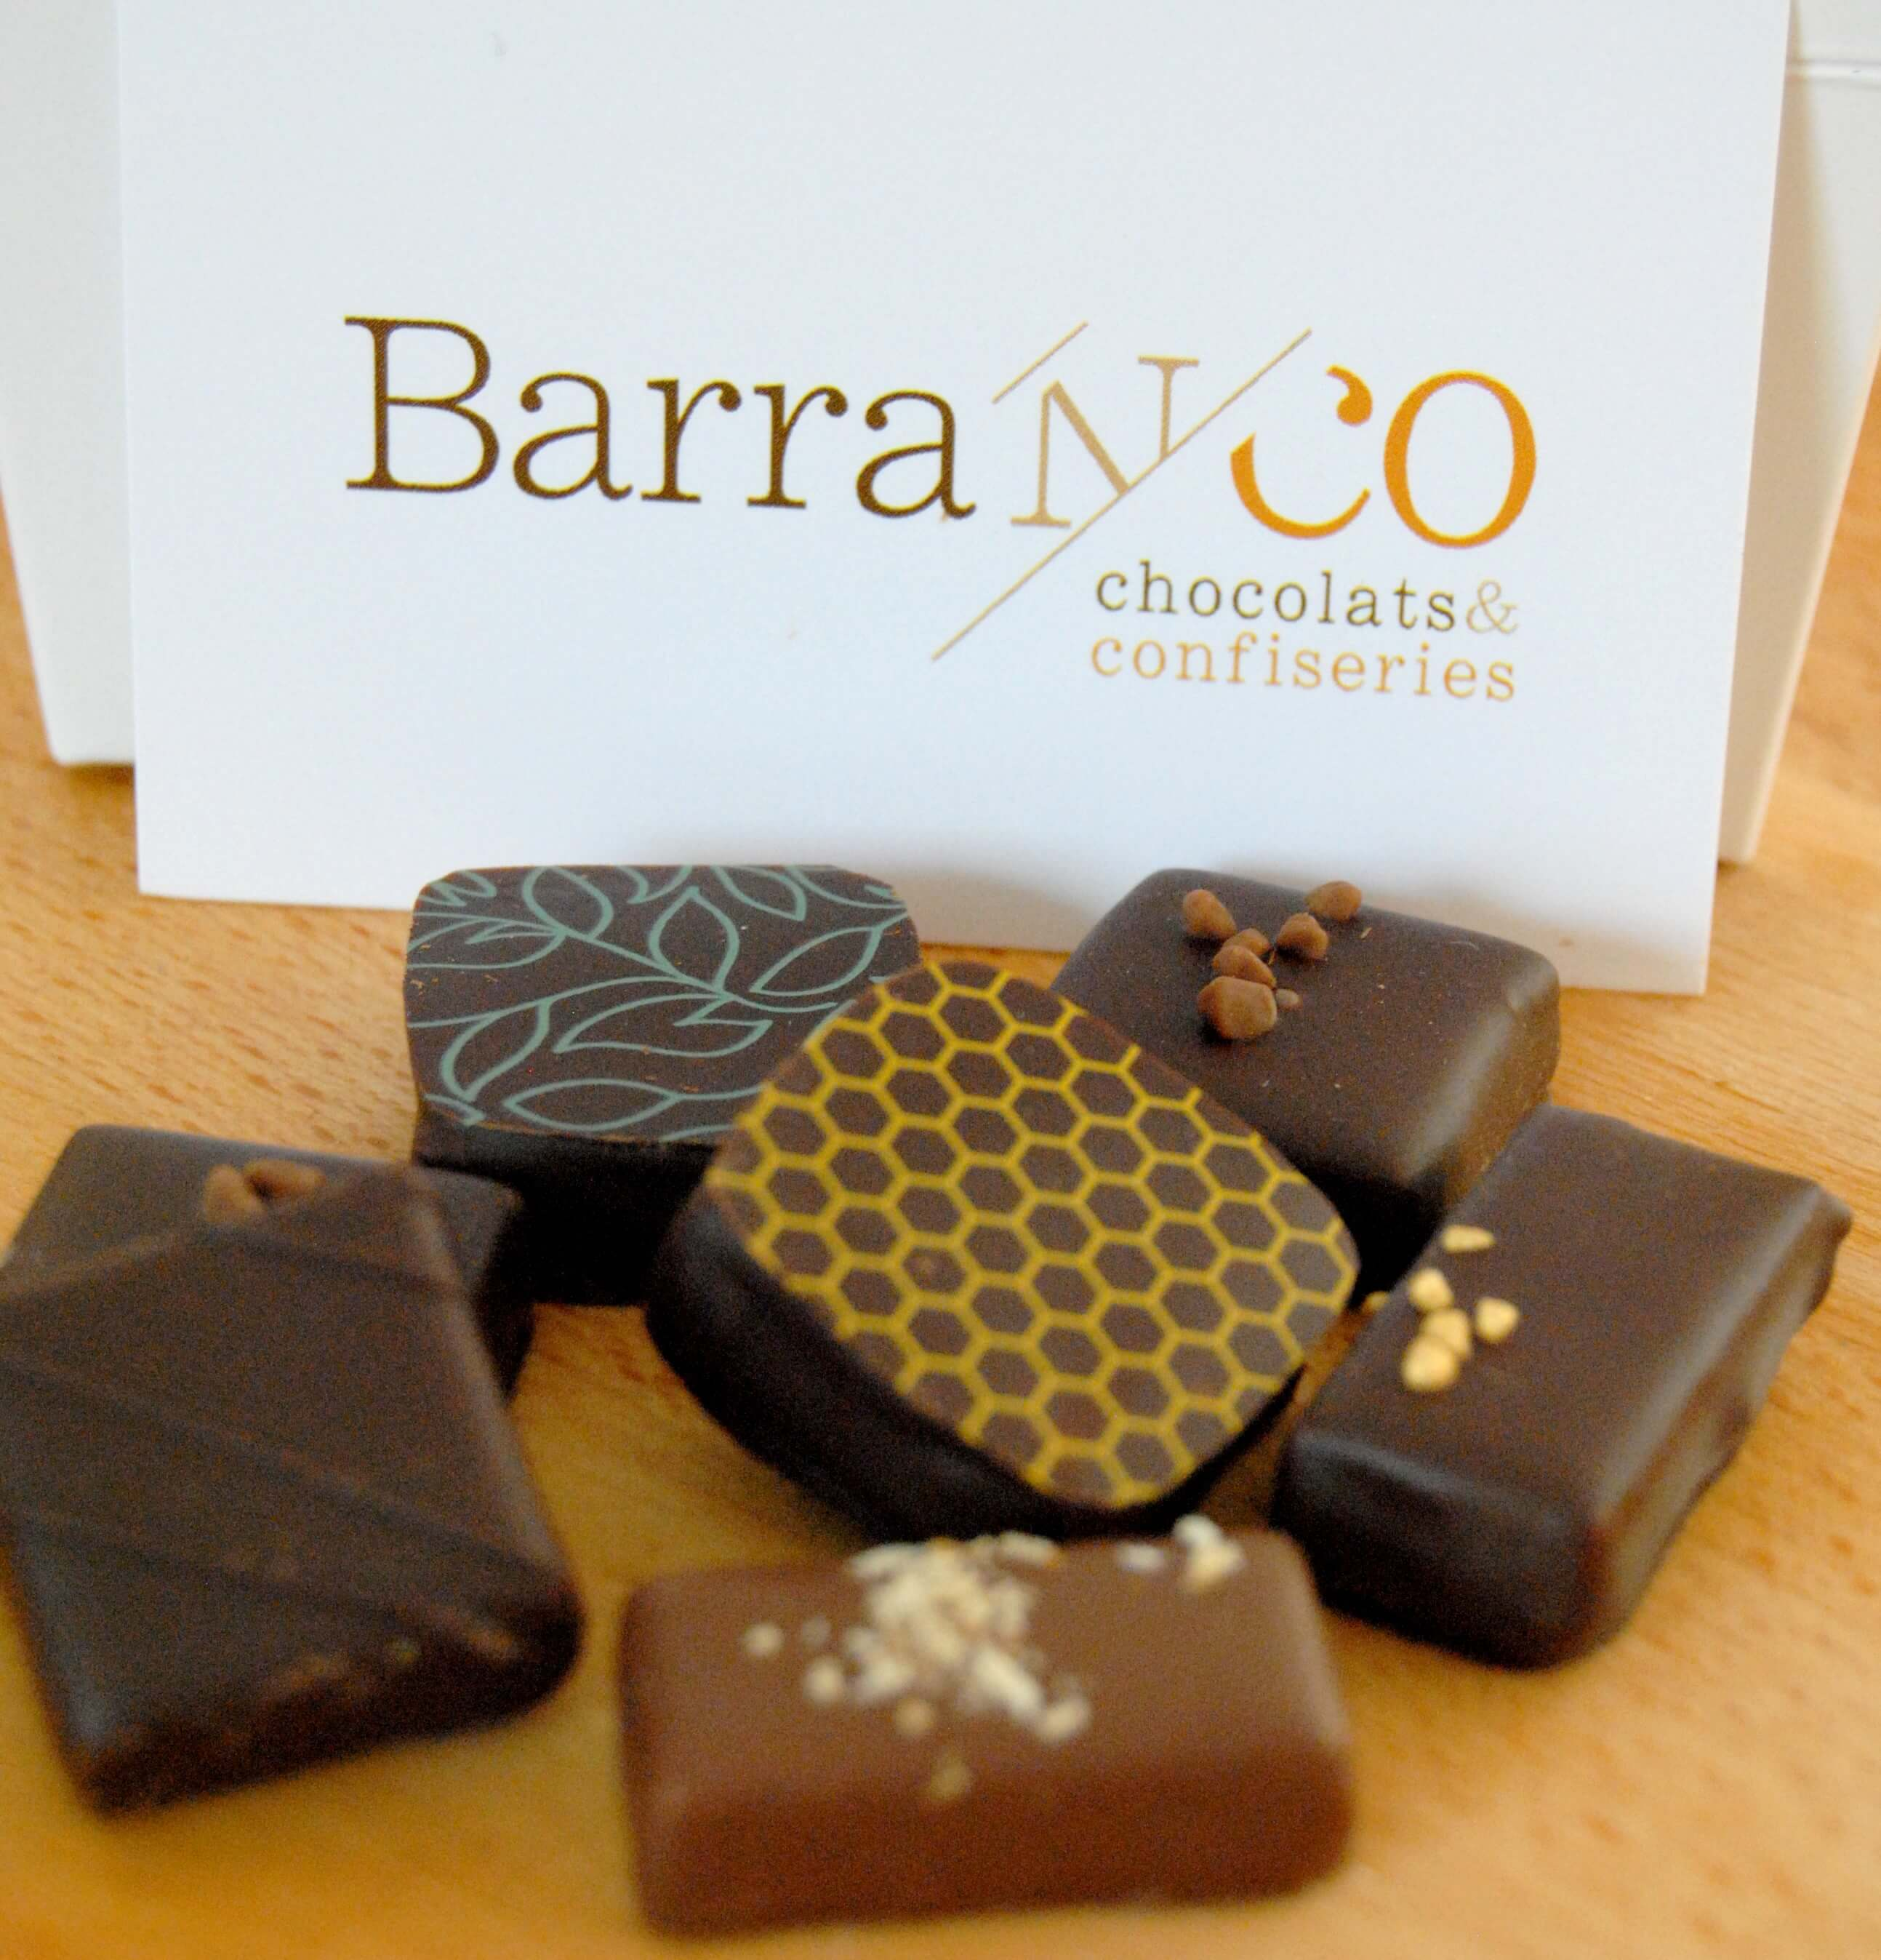 barranco-chocolats